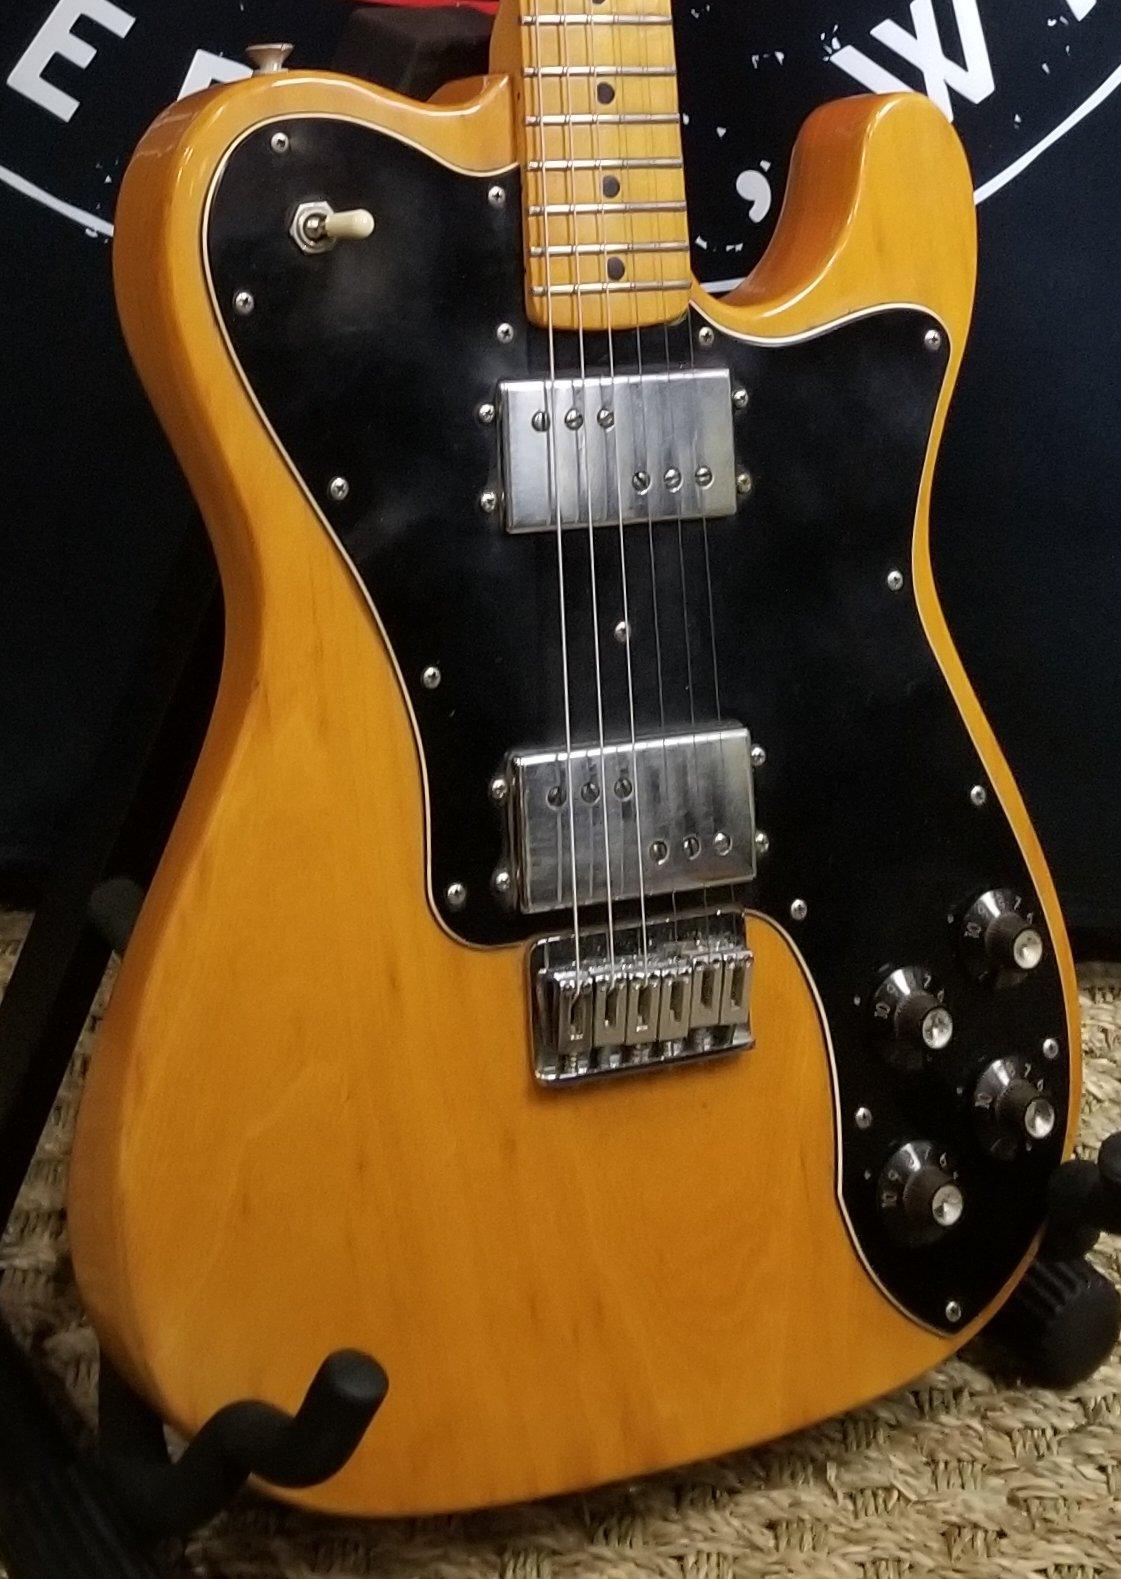 1973 Fender Telecaster Deluxe w/ohc